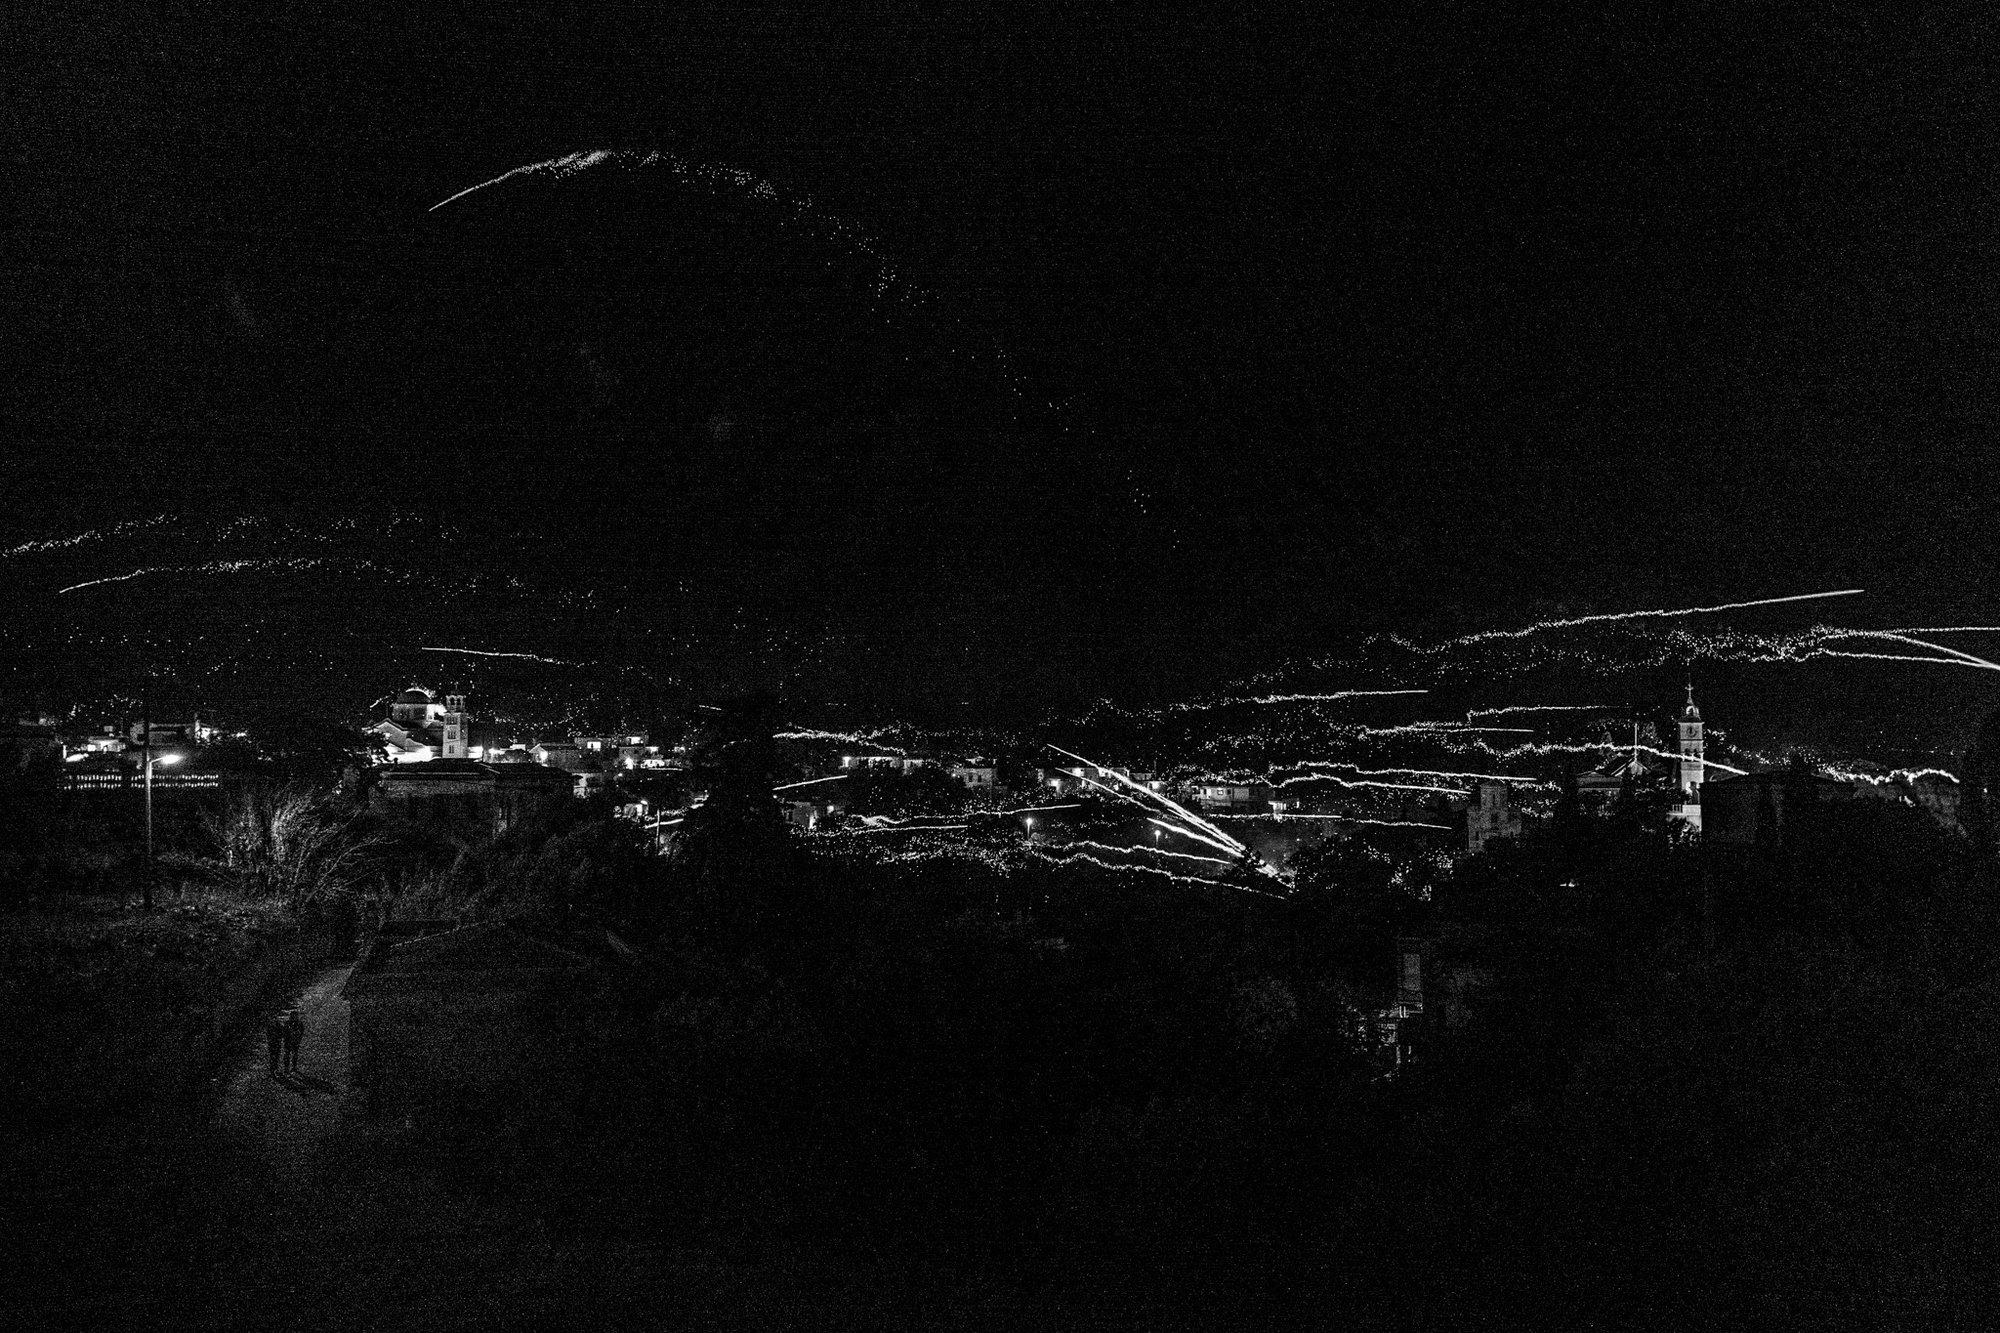 Rocket wars at Vrontados Ελλάδα. Βόρειο Αιγαίο. Chios.